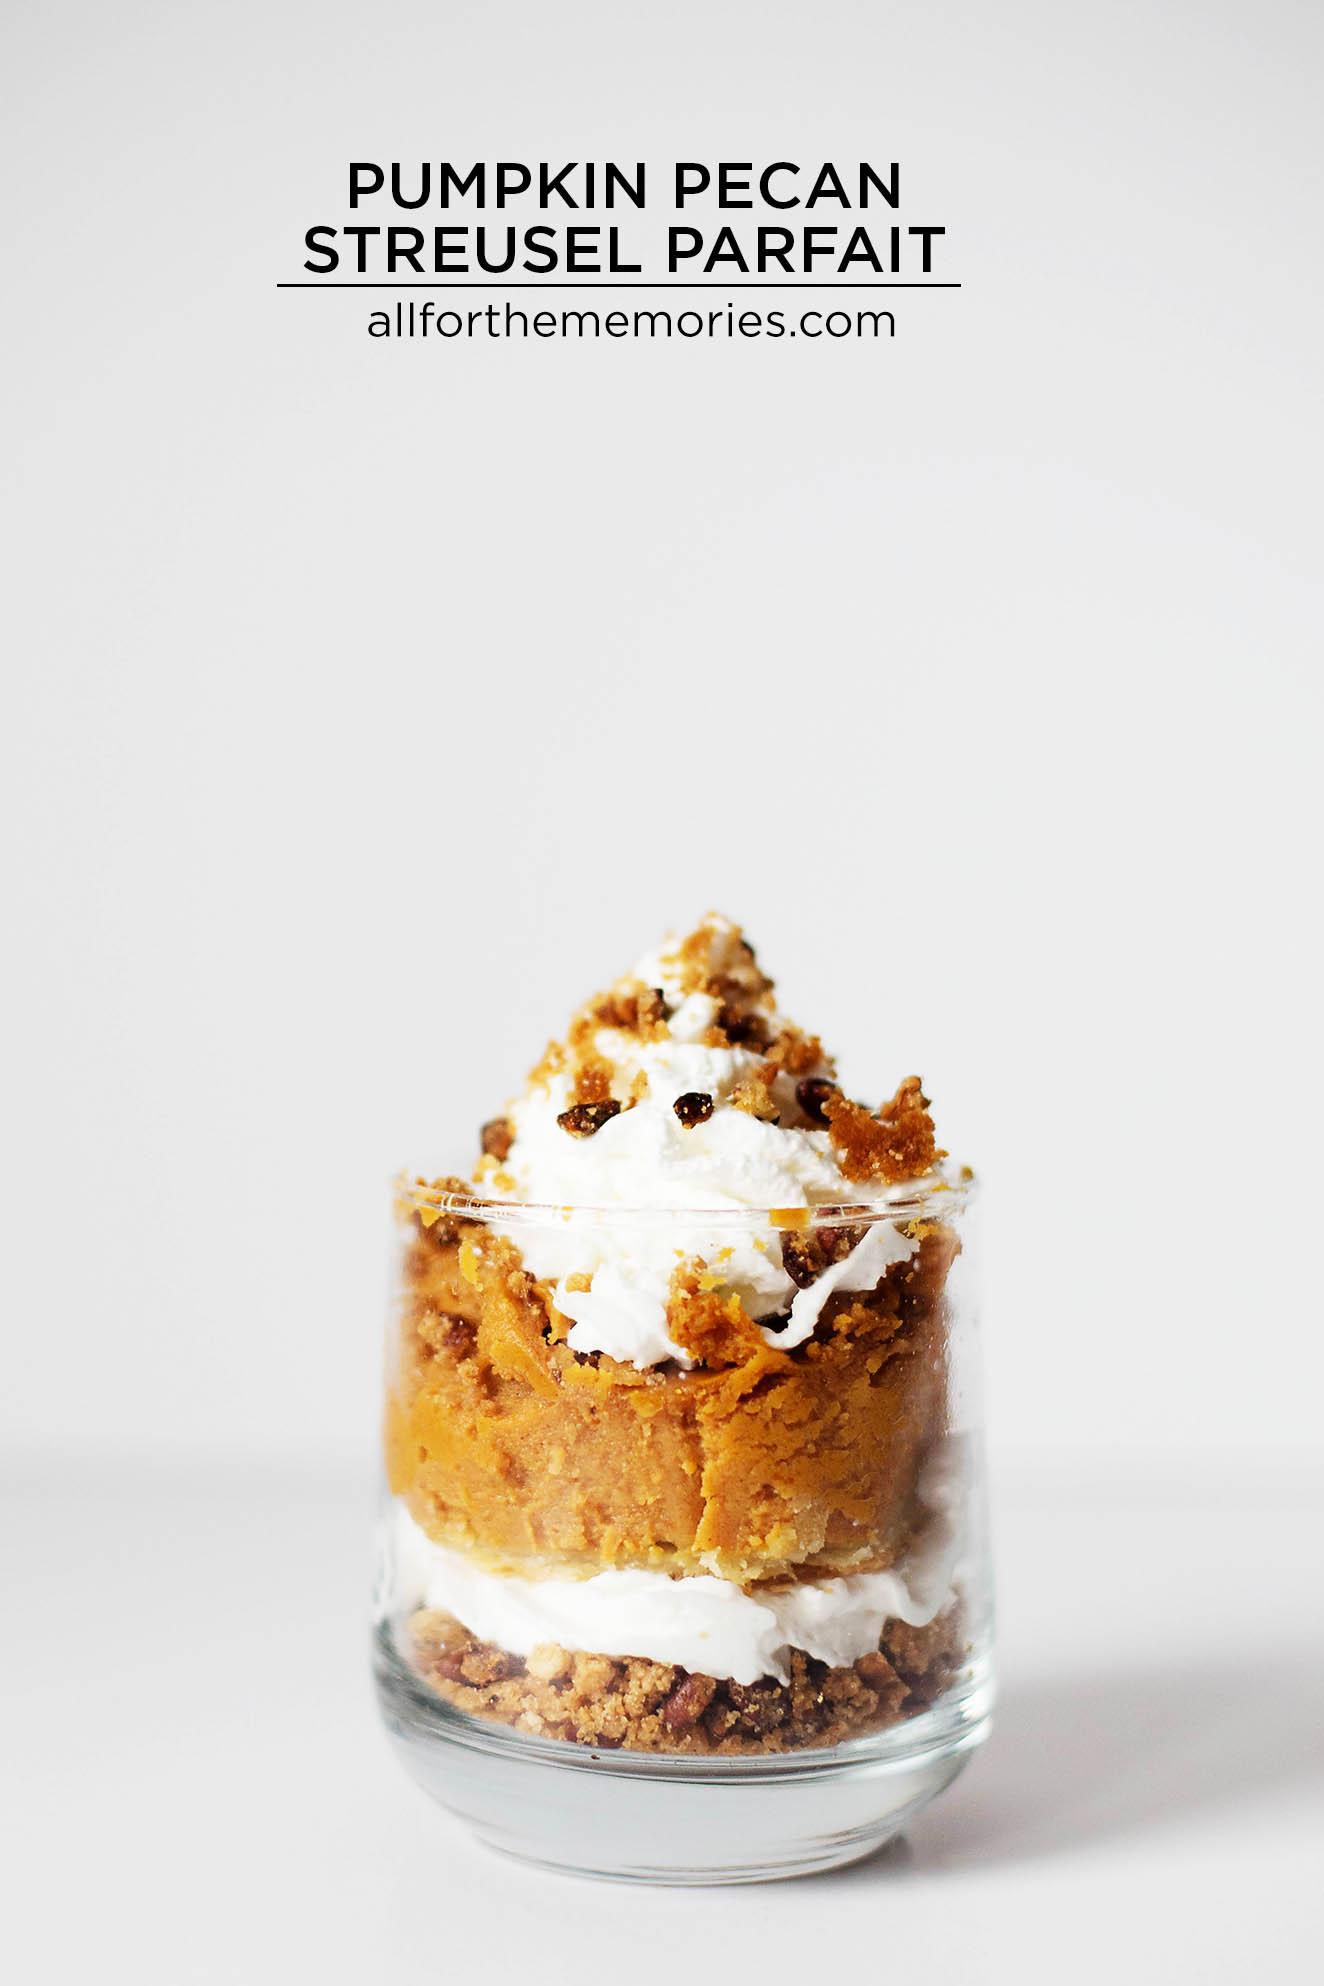 Easy Pumpkin Pecan Streusel Parfait